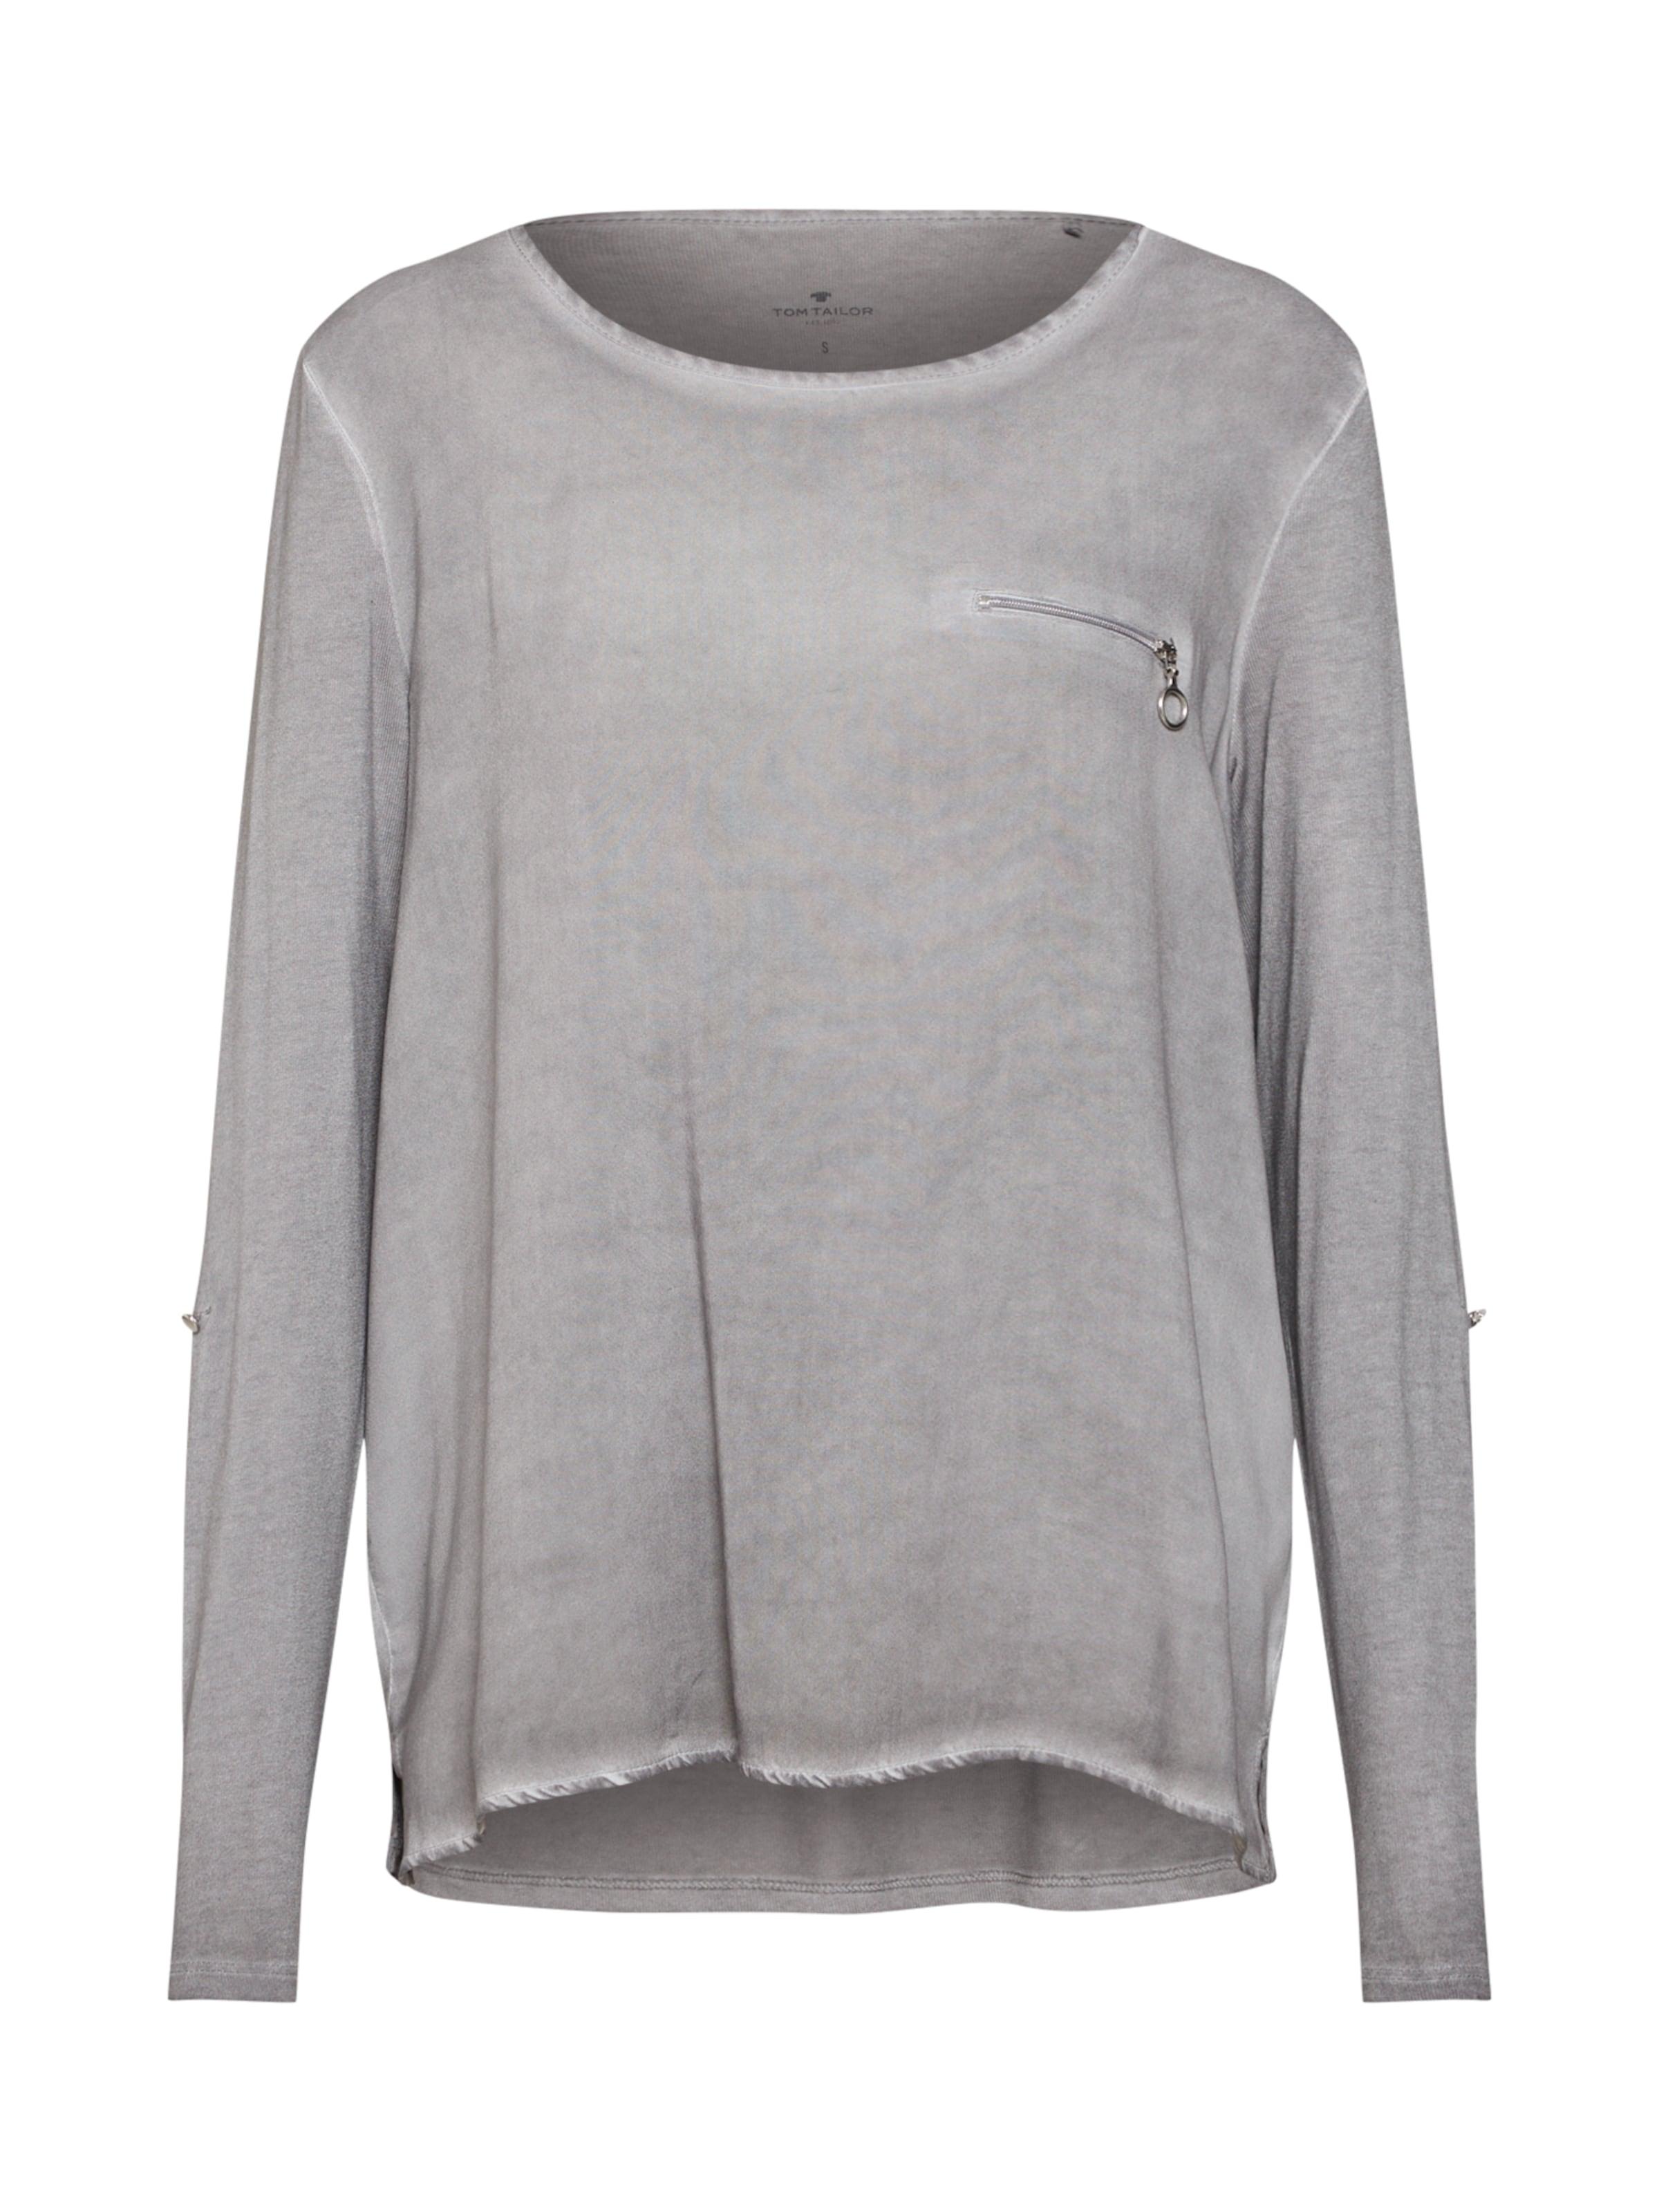 shirt Tailor T Violet Tom En drxsQthBCo